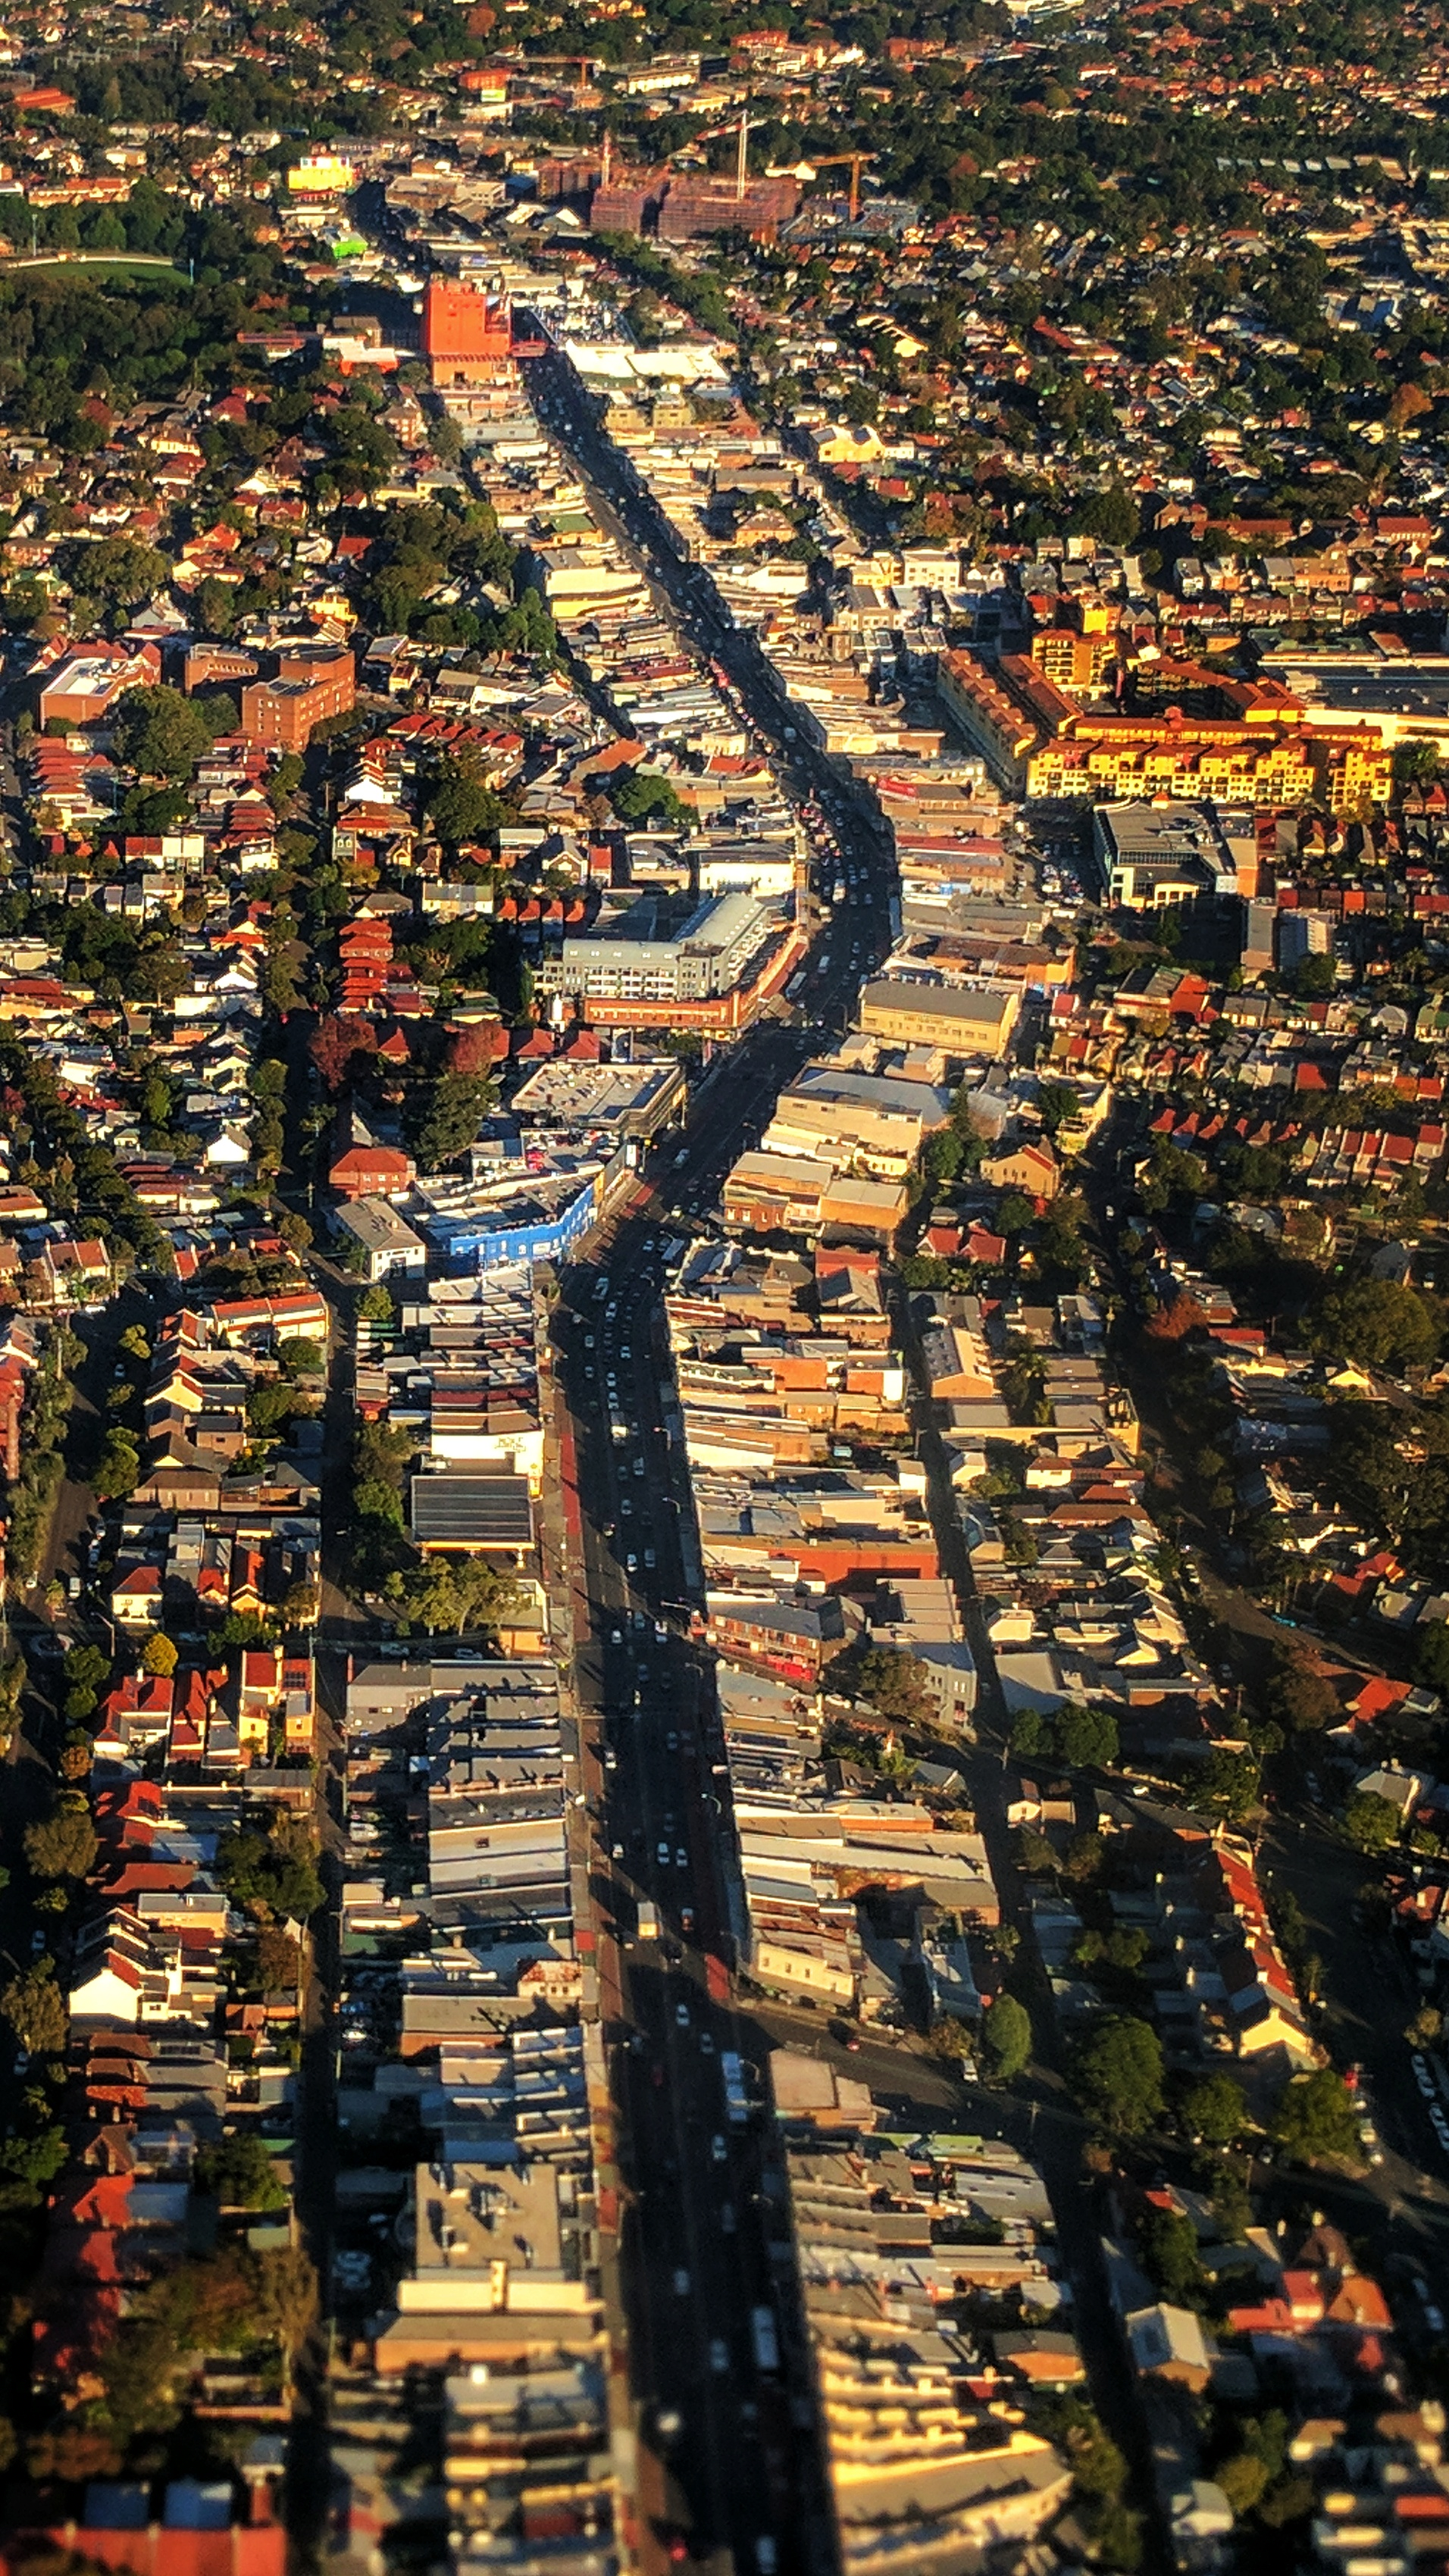 A Sydney highstreet as seen from above